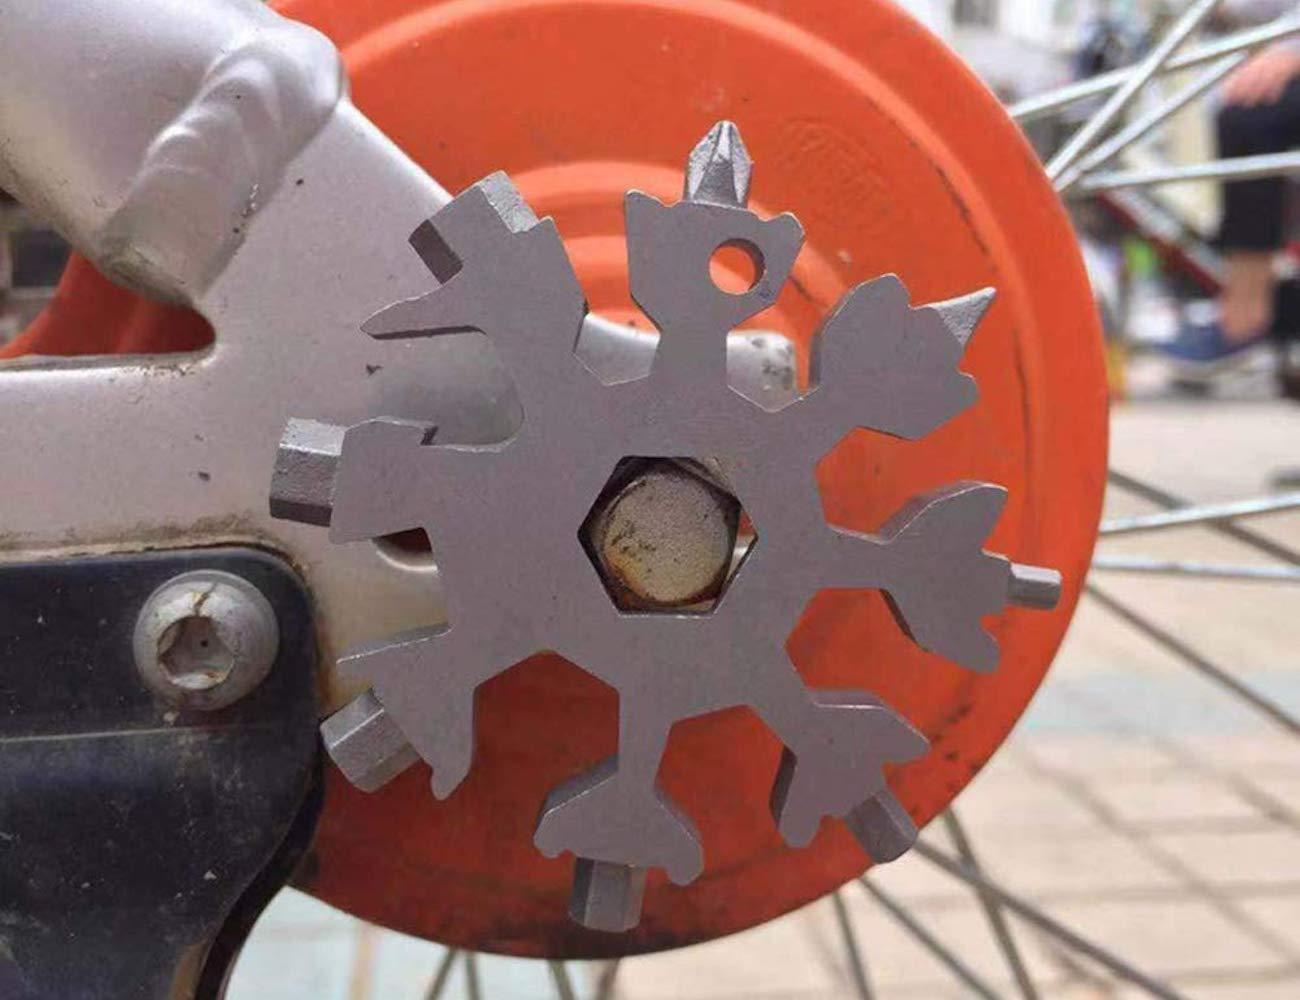 Snowflake Stainless Steel Multi Tool